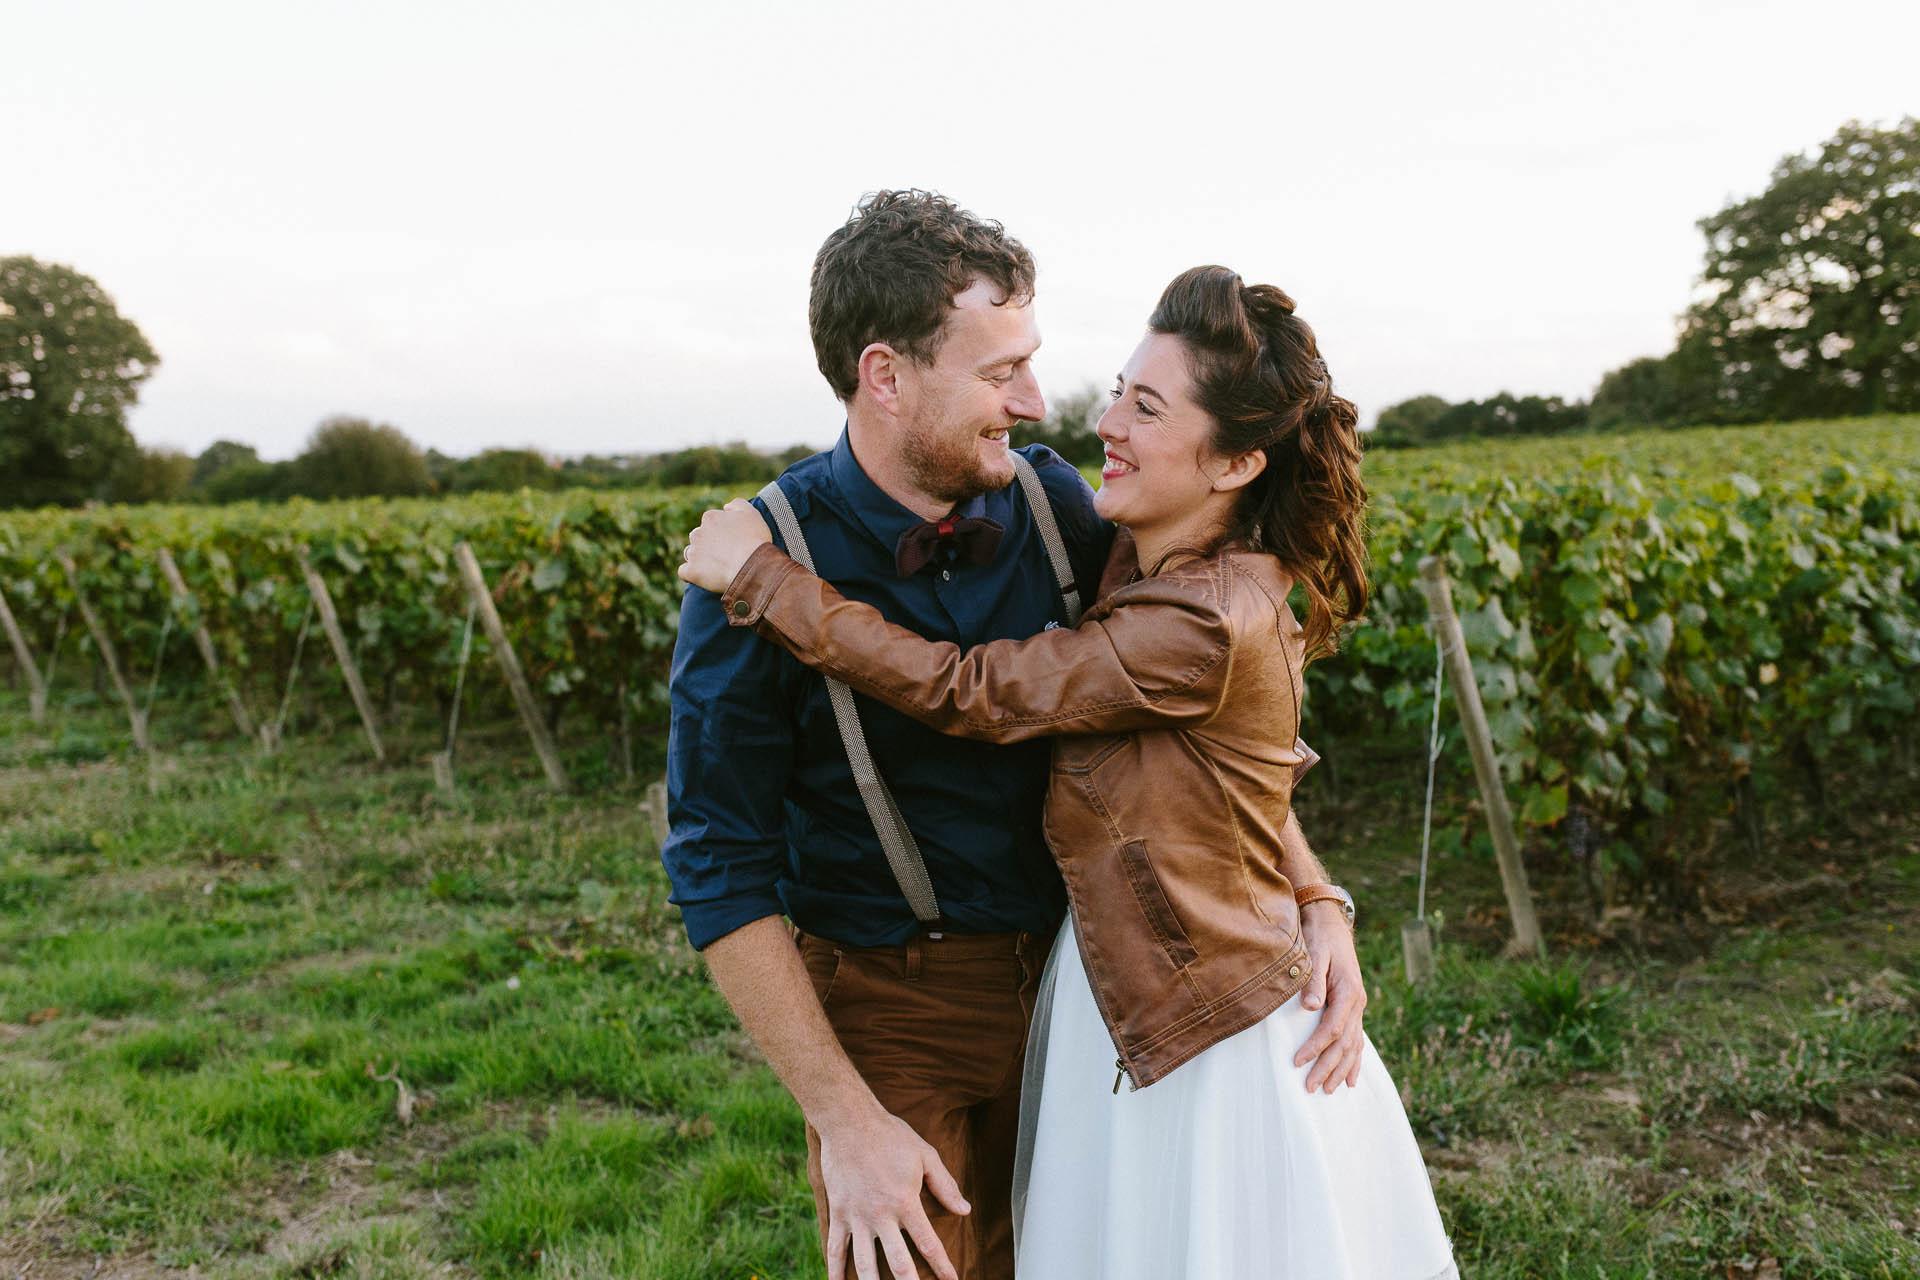 mariage_vignobles_mourat_vendee_jeremy_agathe_flavie_nelly-533